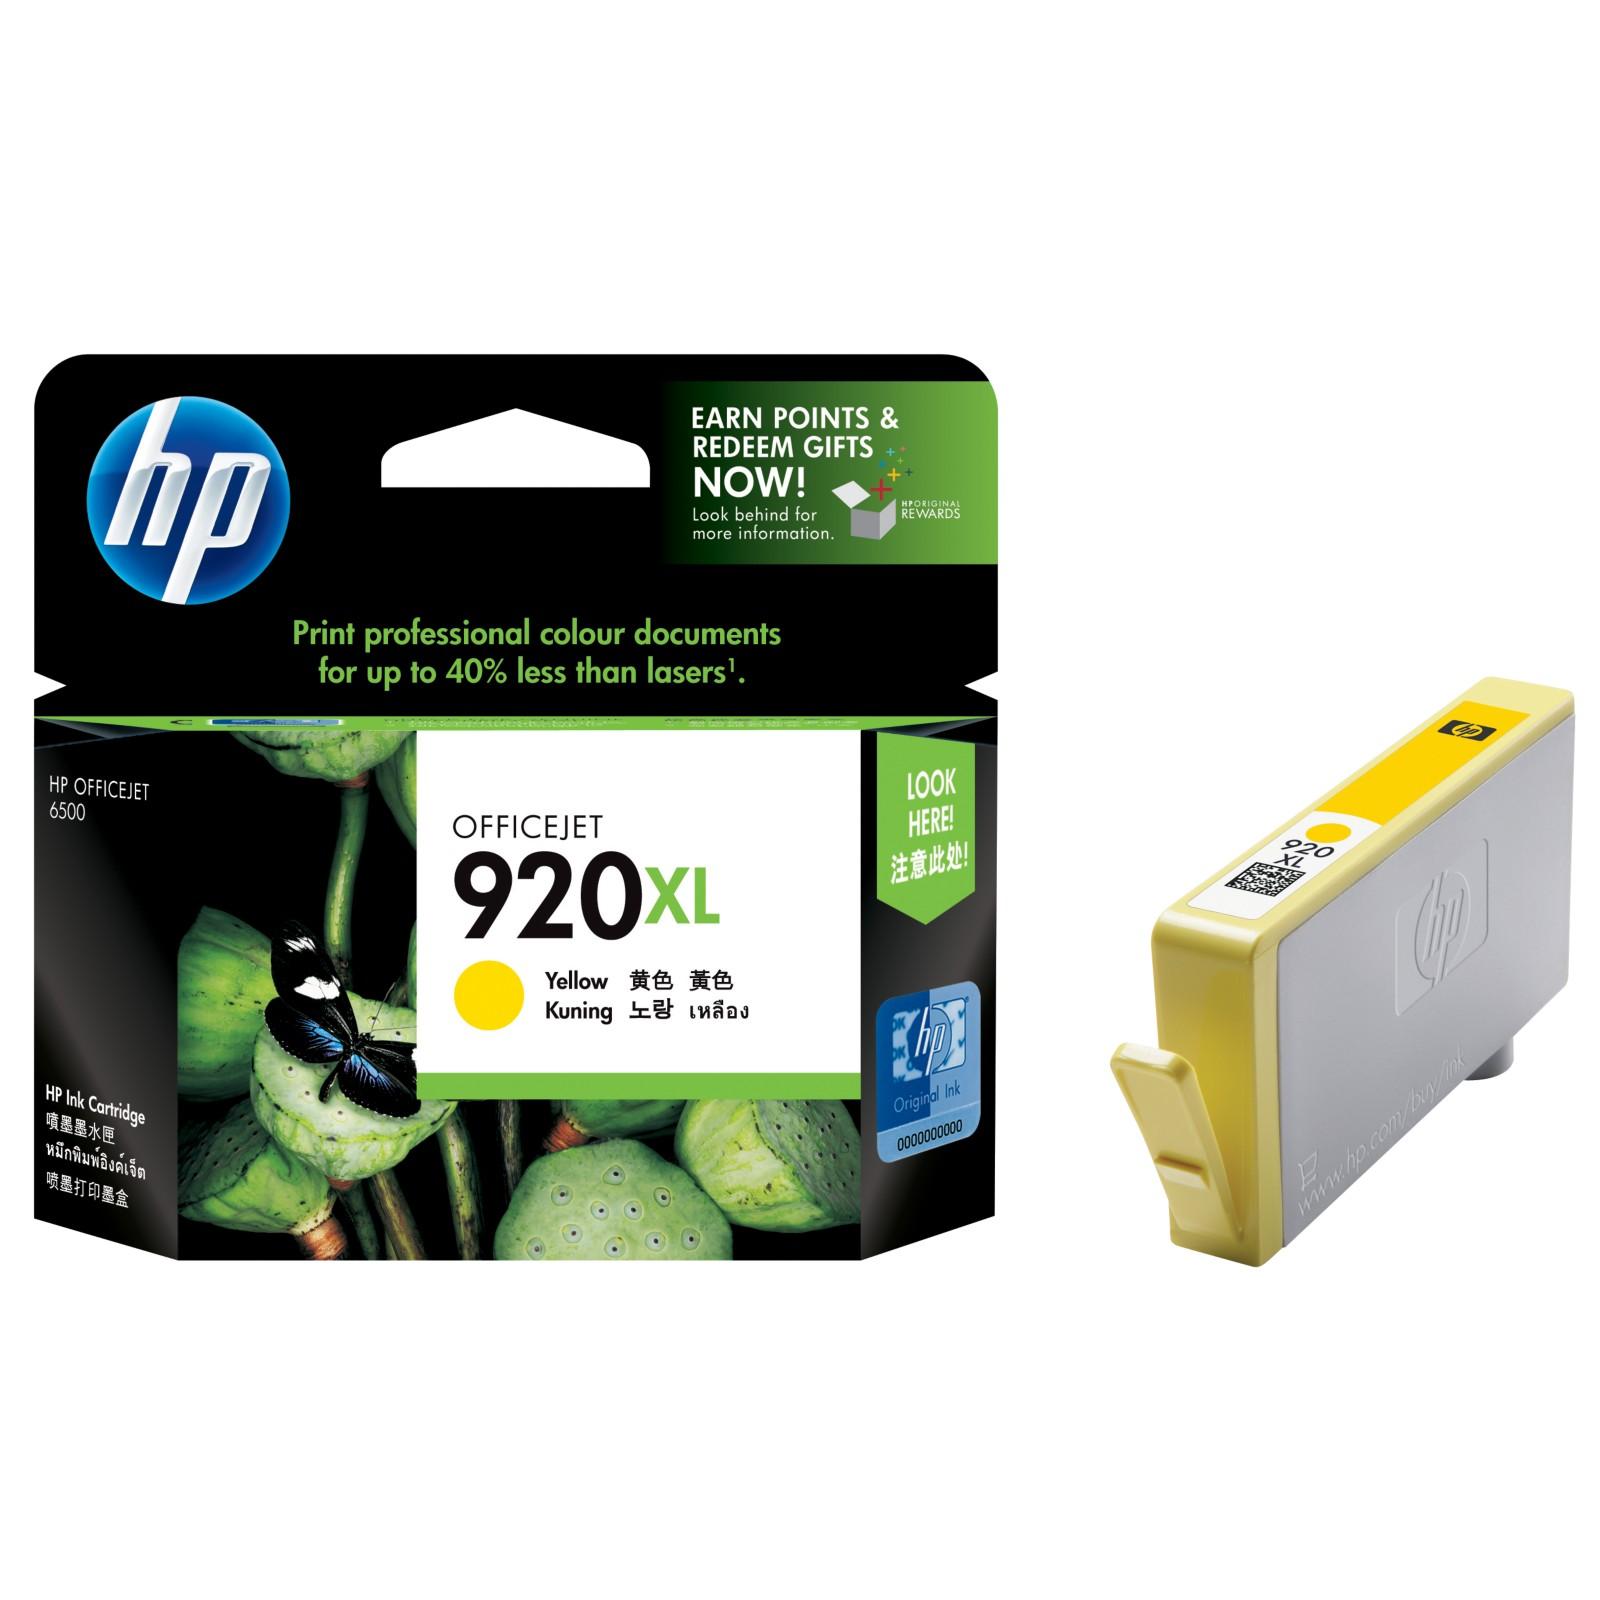 HP Officejet 920XL Colour Ink Cartridge Yellow